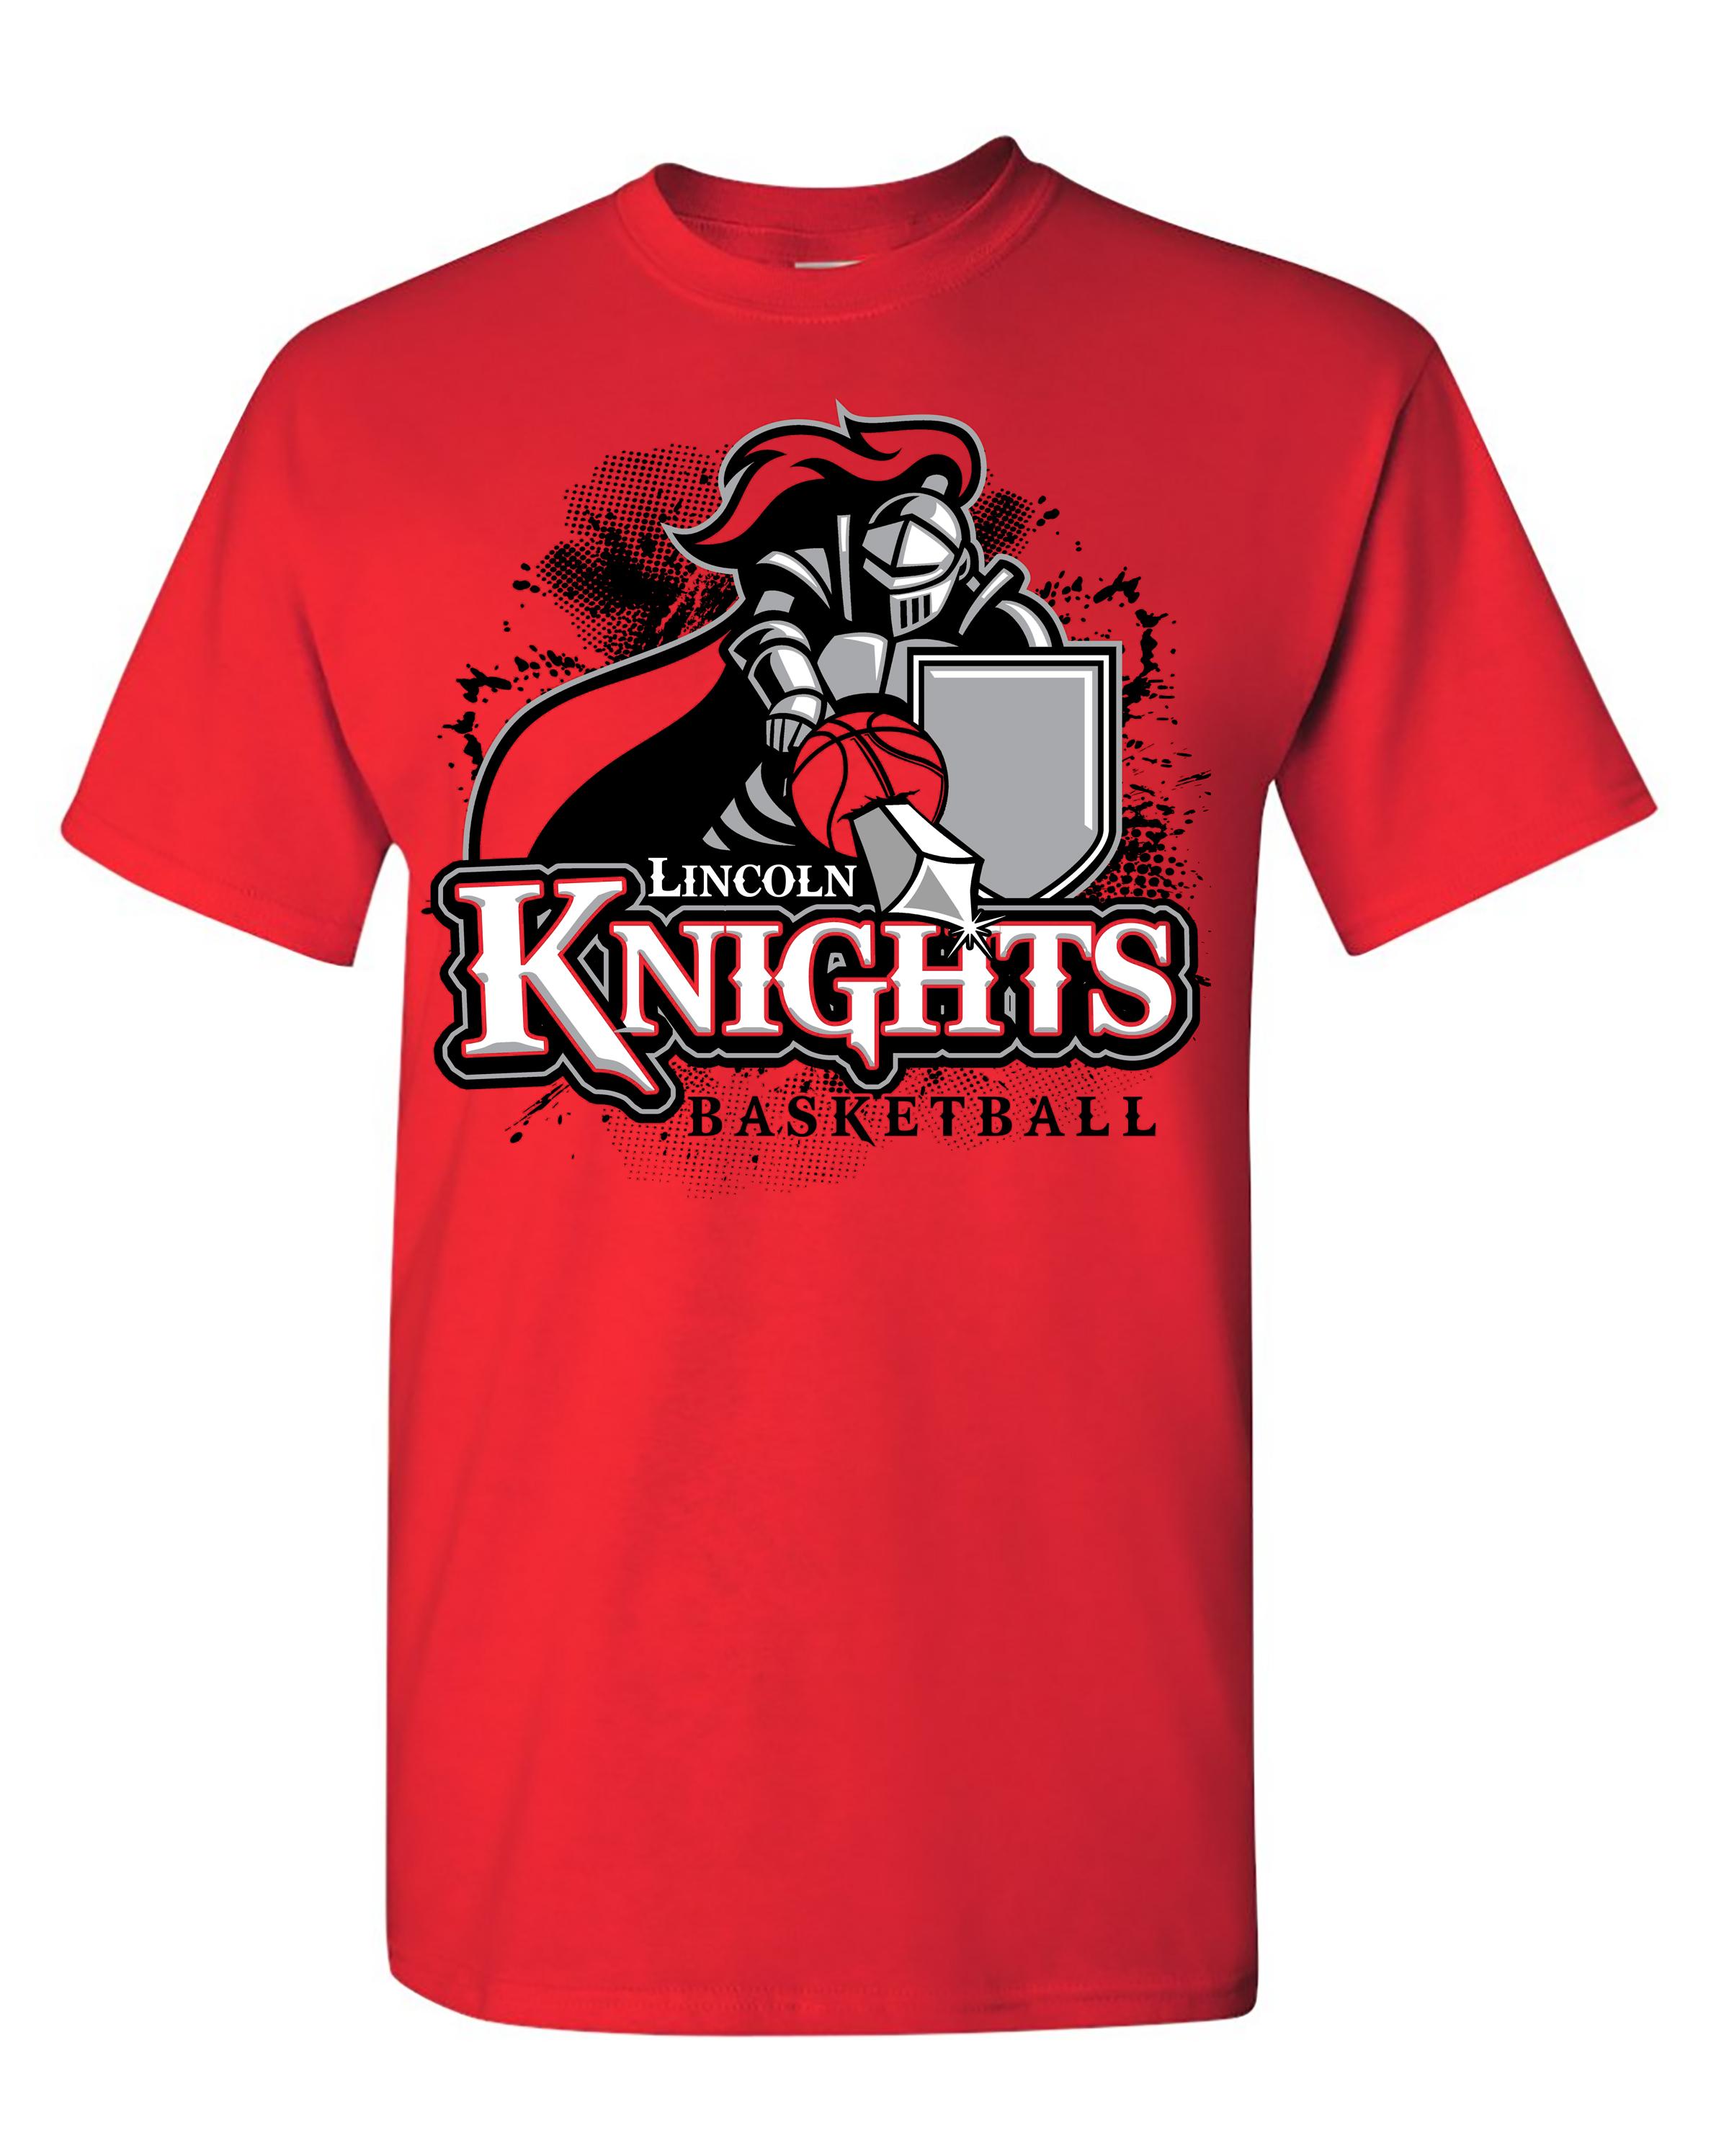 Lincoln Knights Basketball